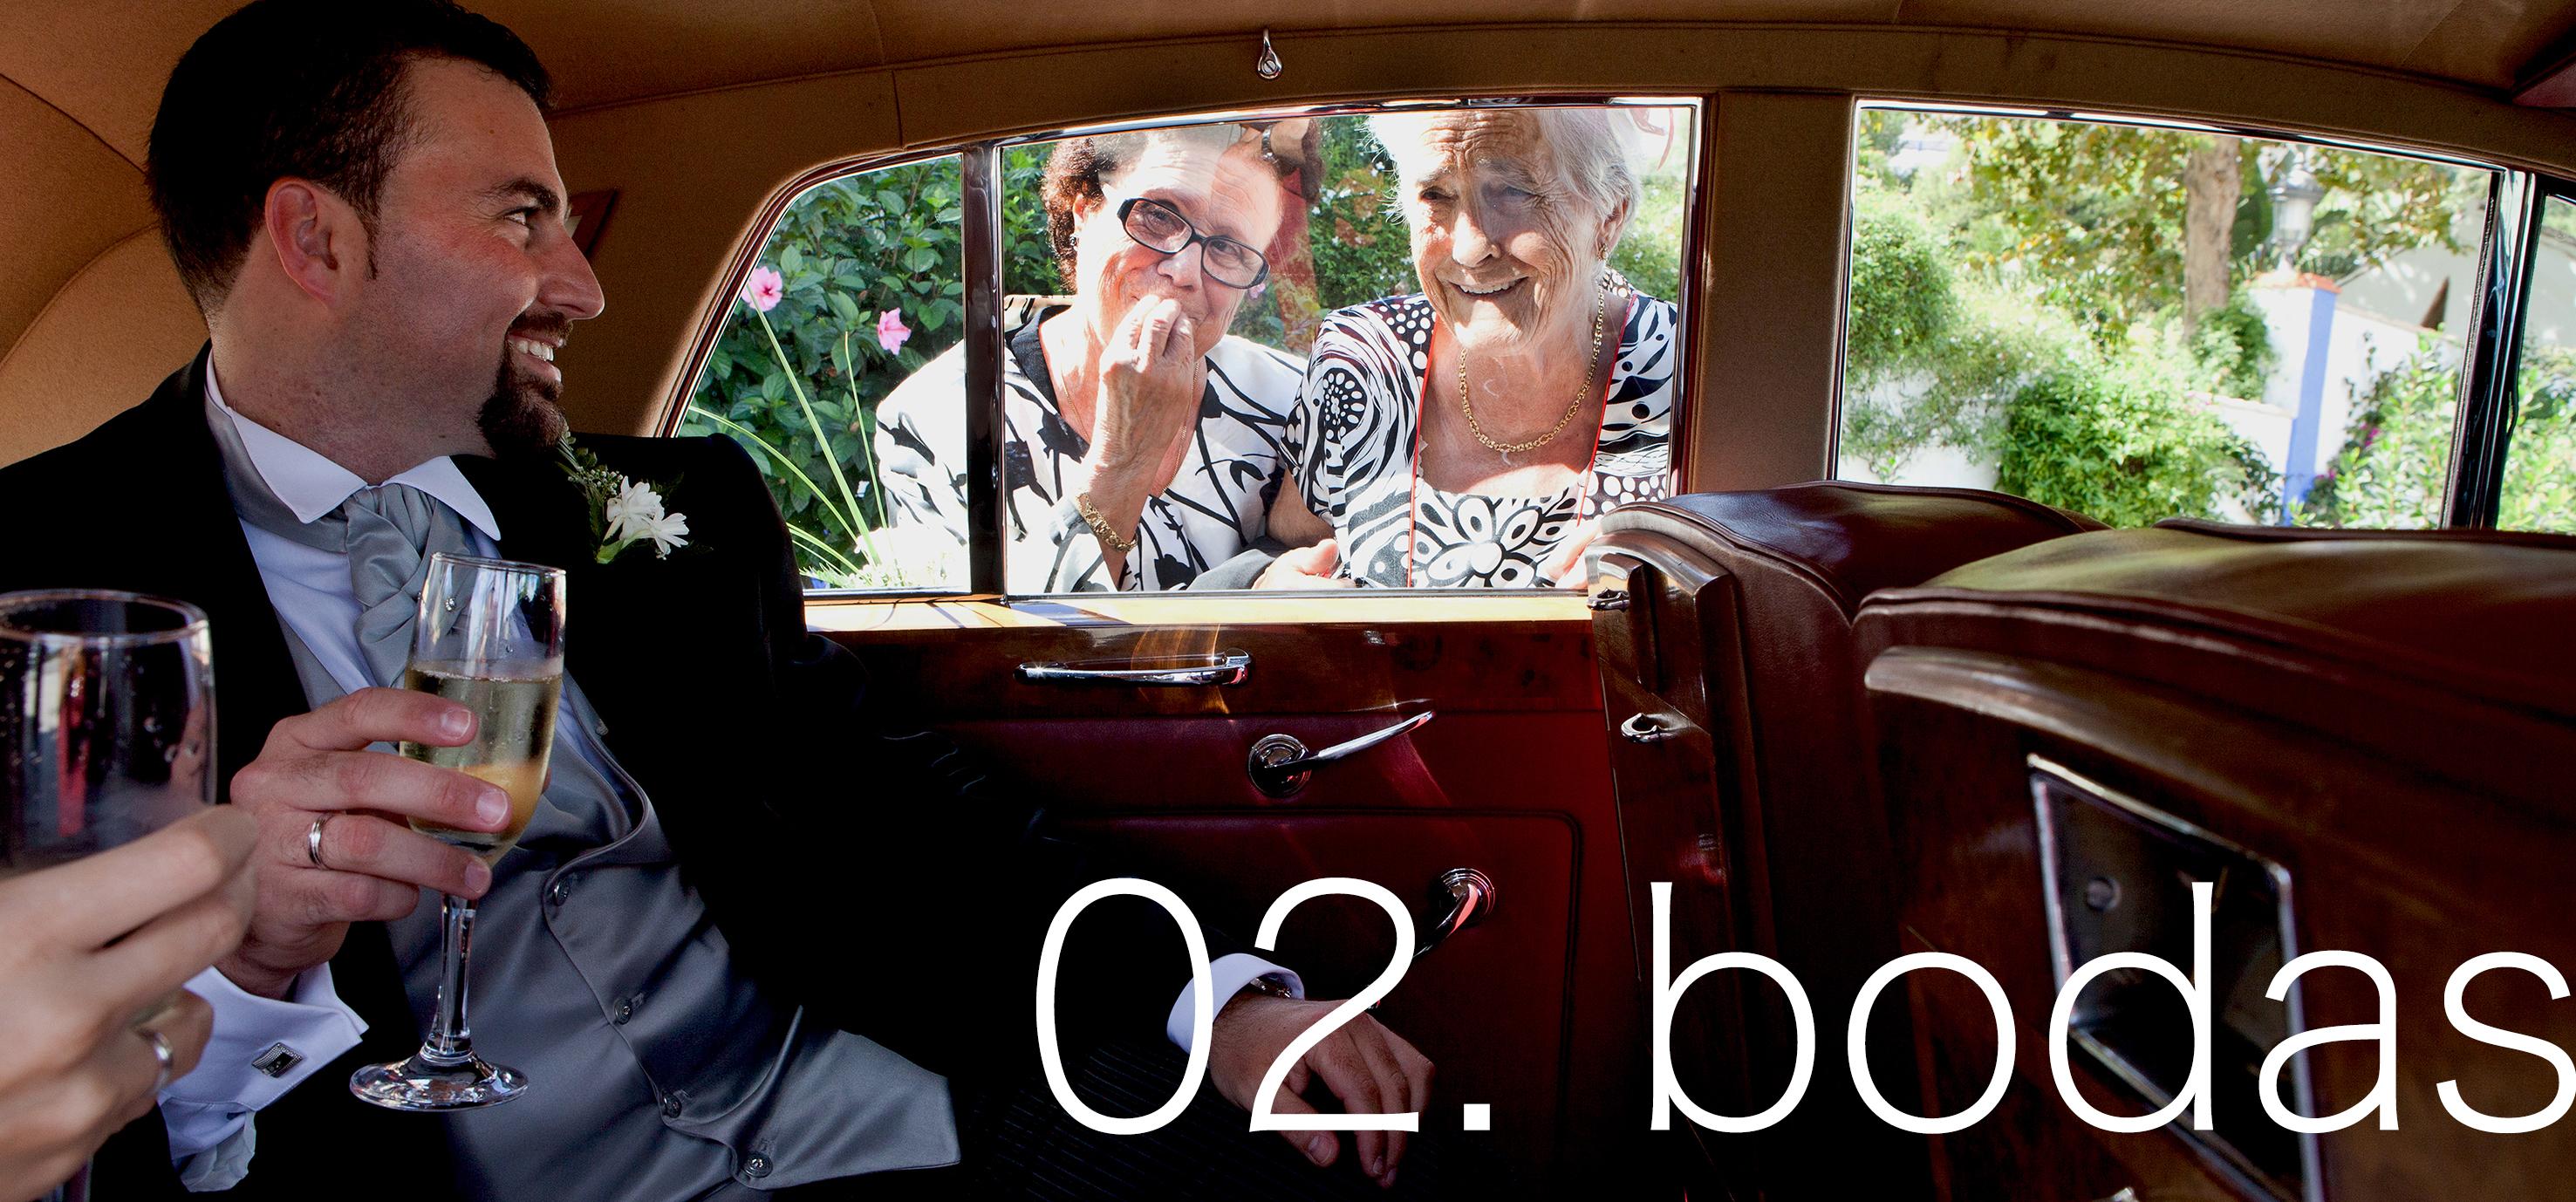 02 Bodas - Fotografo Bodas Miguel Barranco